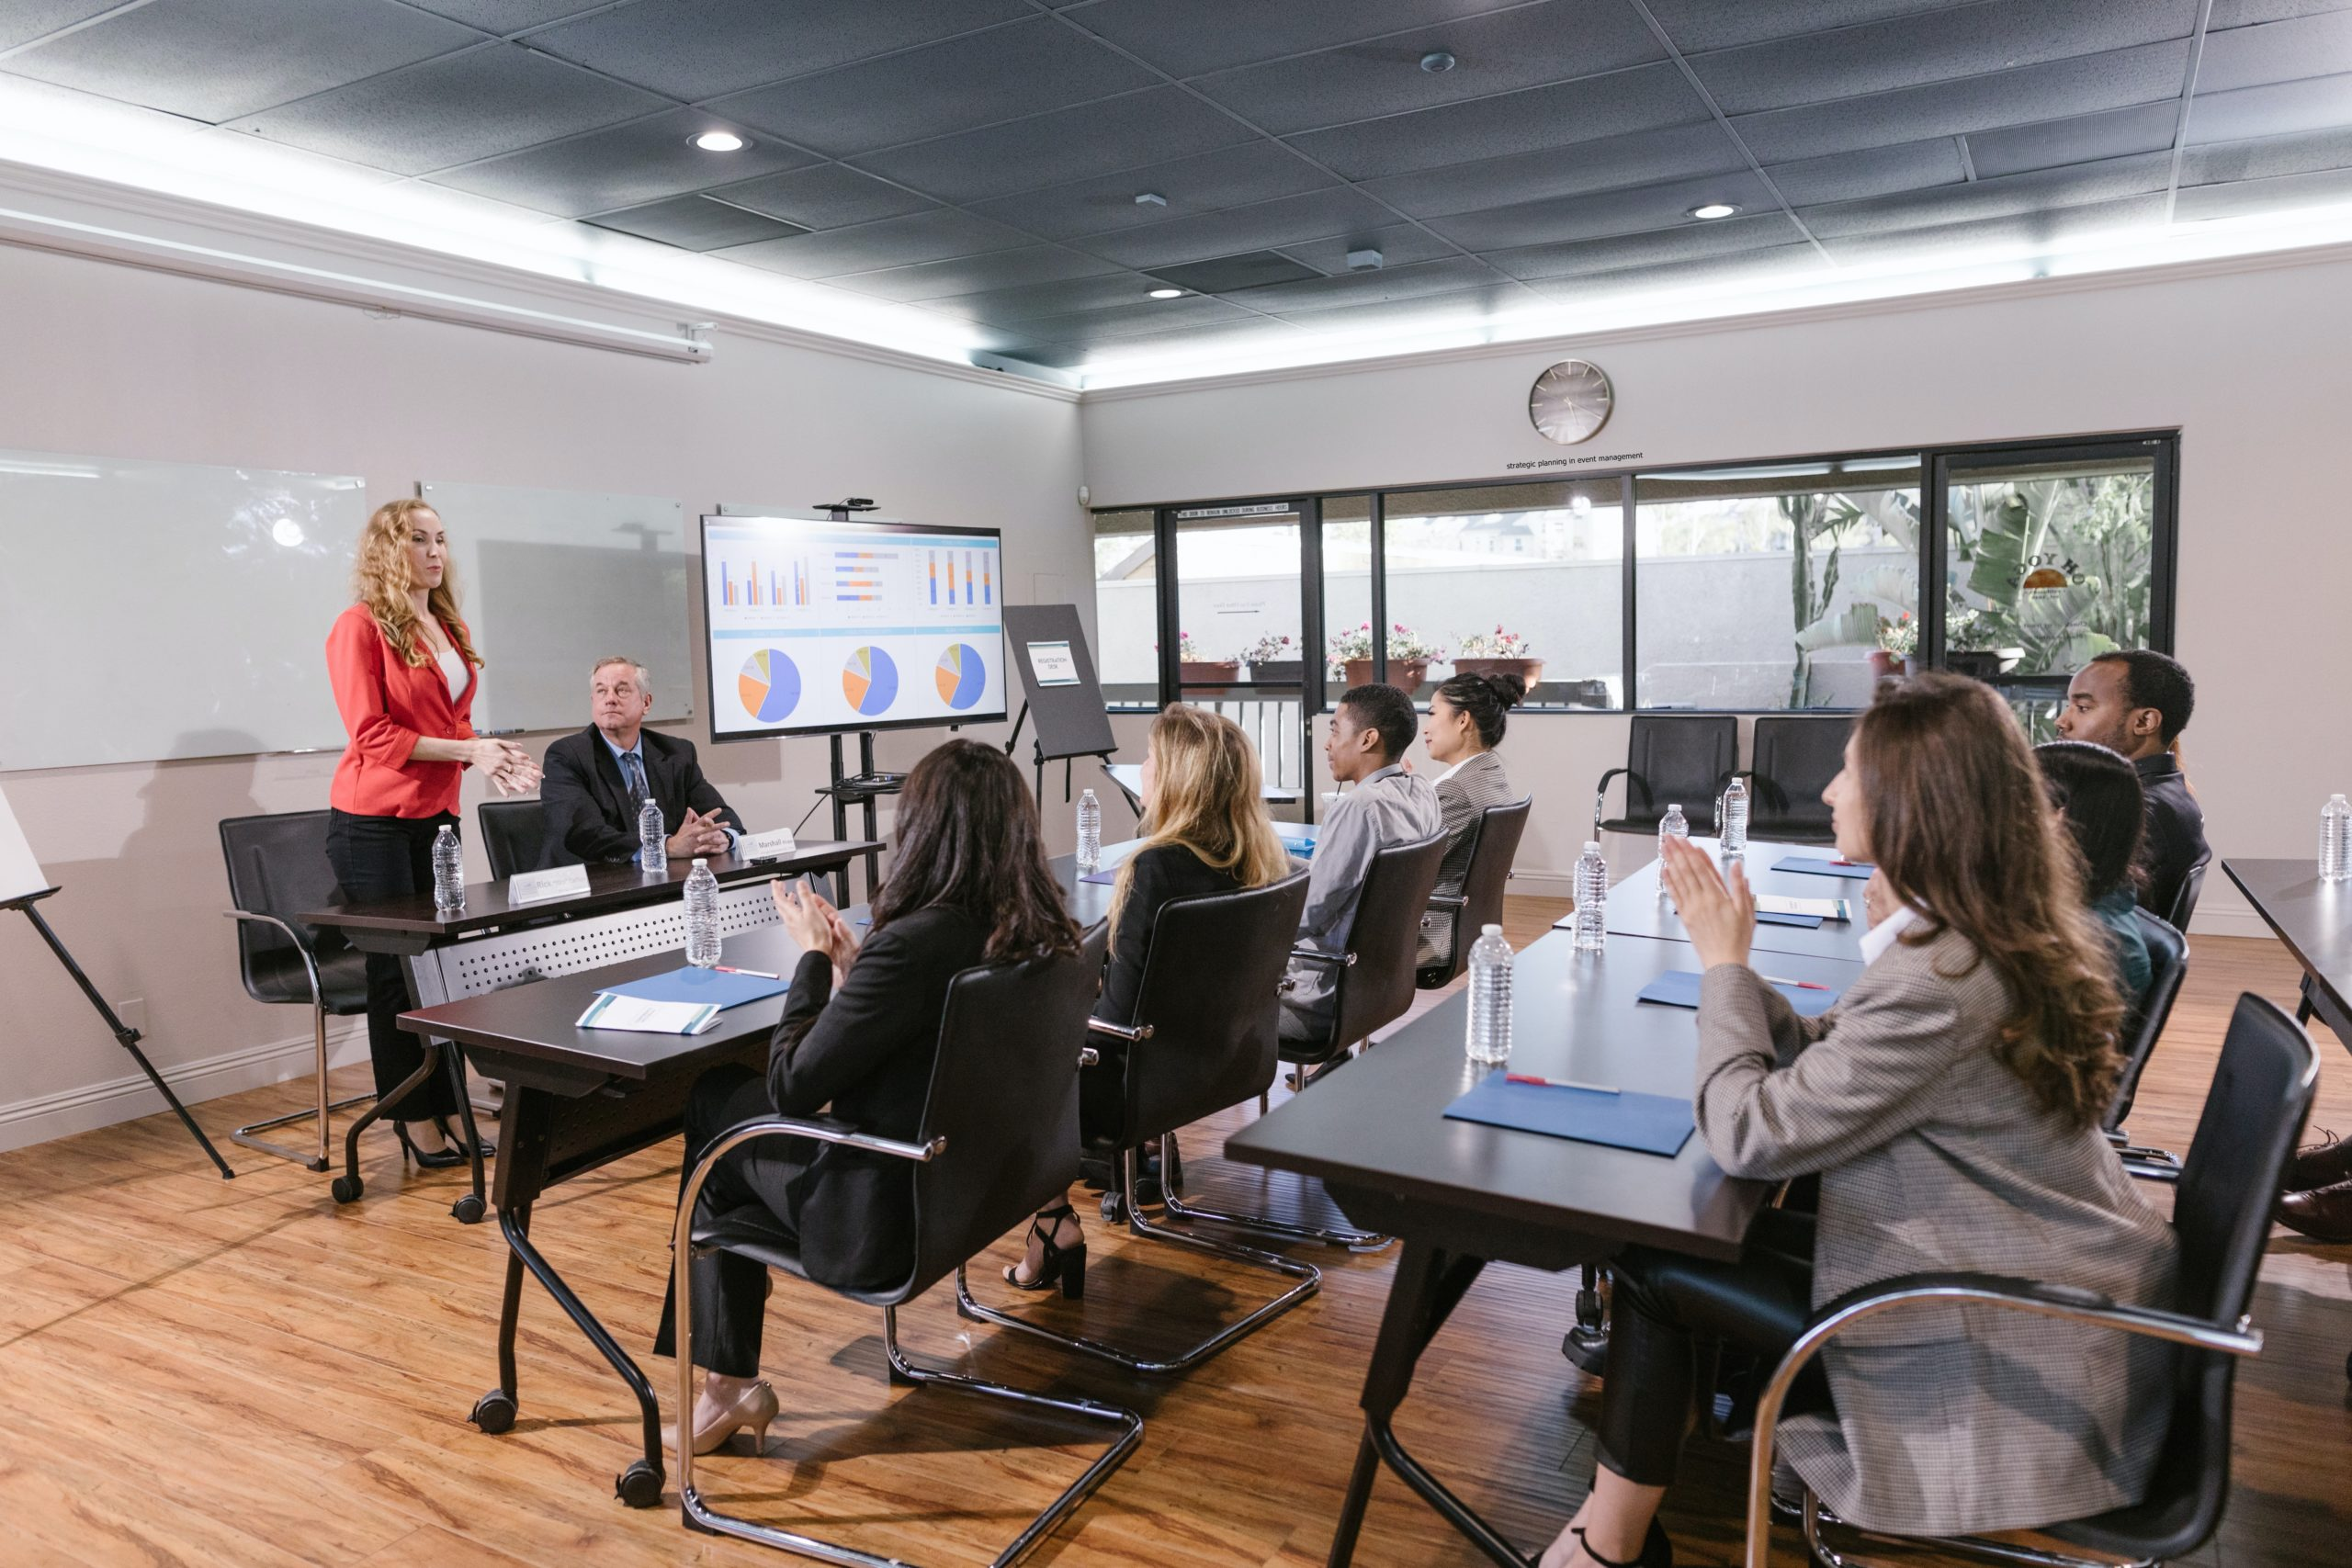 strategic planning in event management image